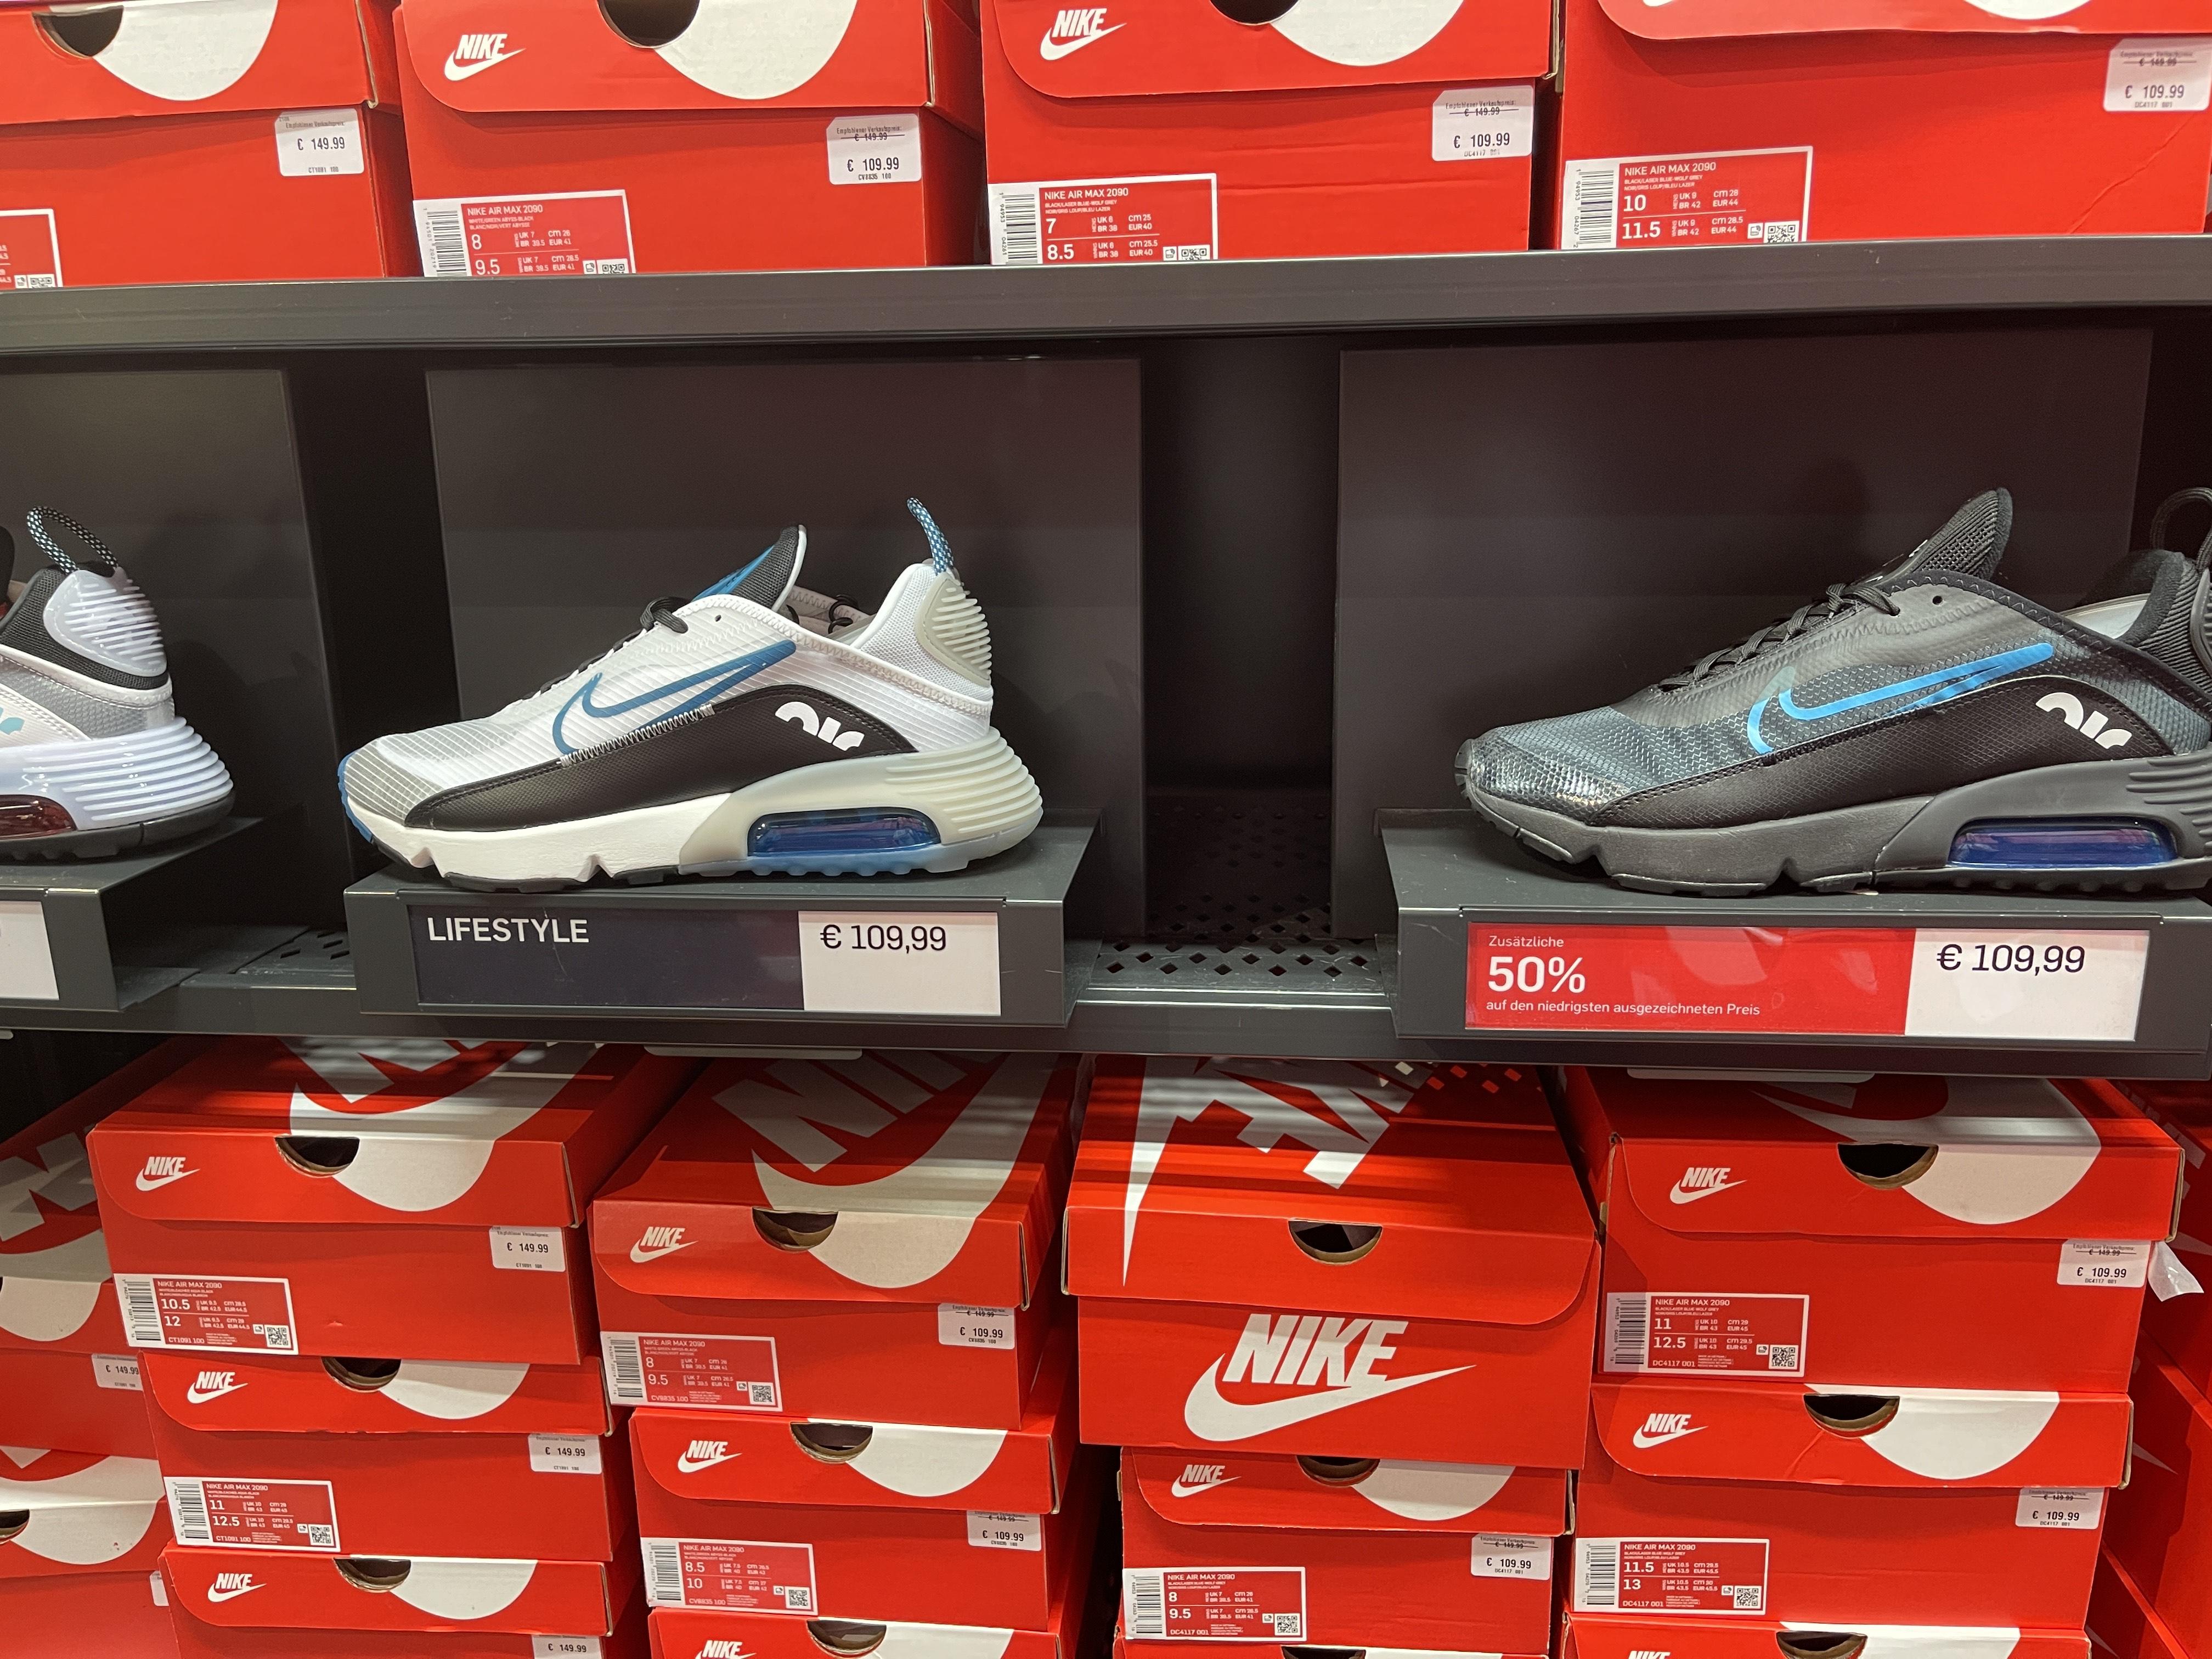 Nike Air Max 2090 Black/Blue Lokal/Bremen (Nike Factory Store)